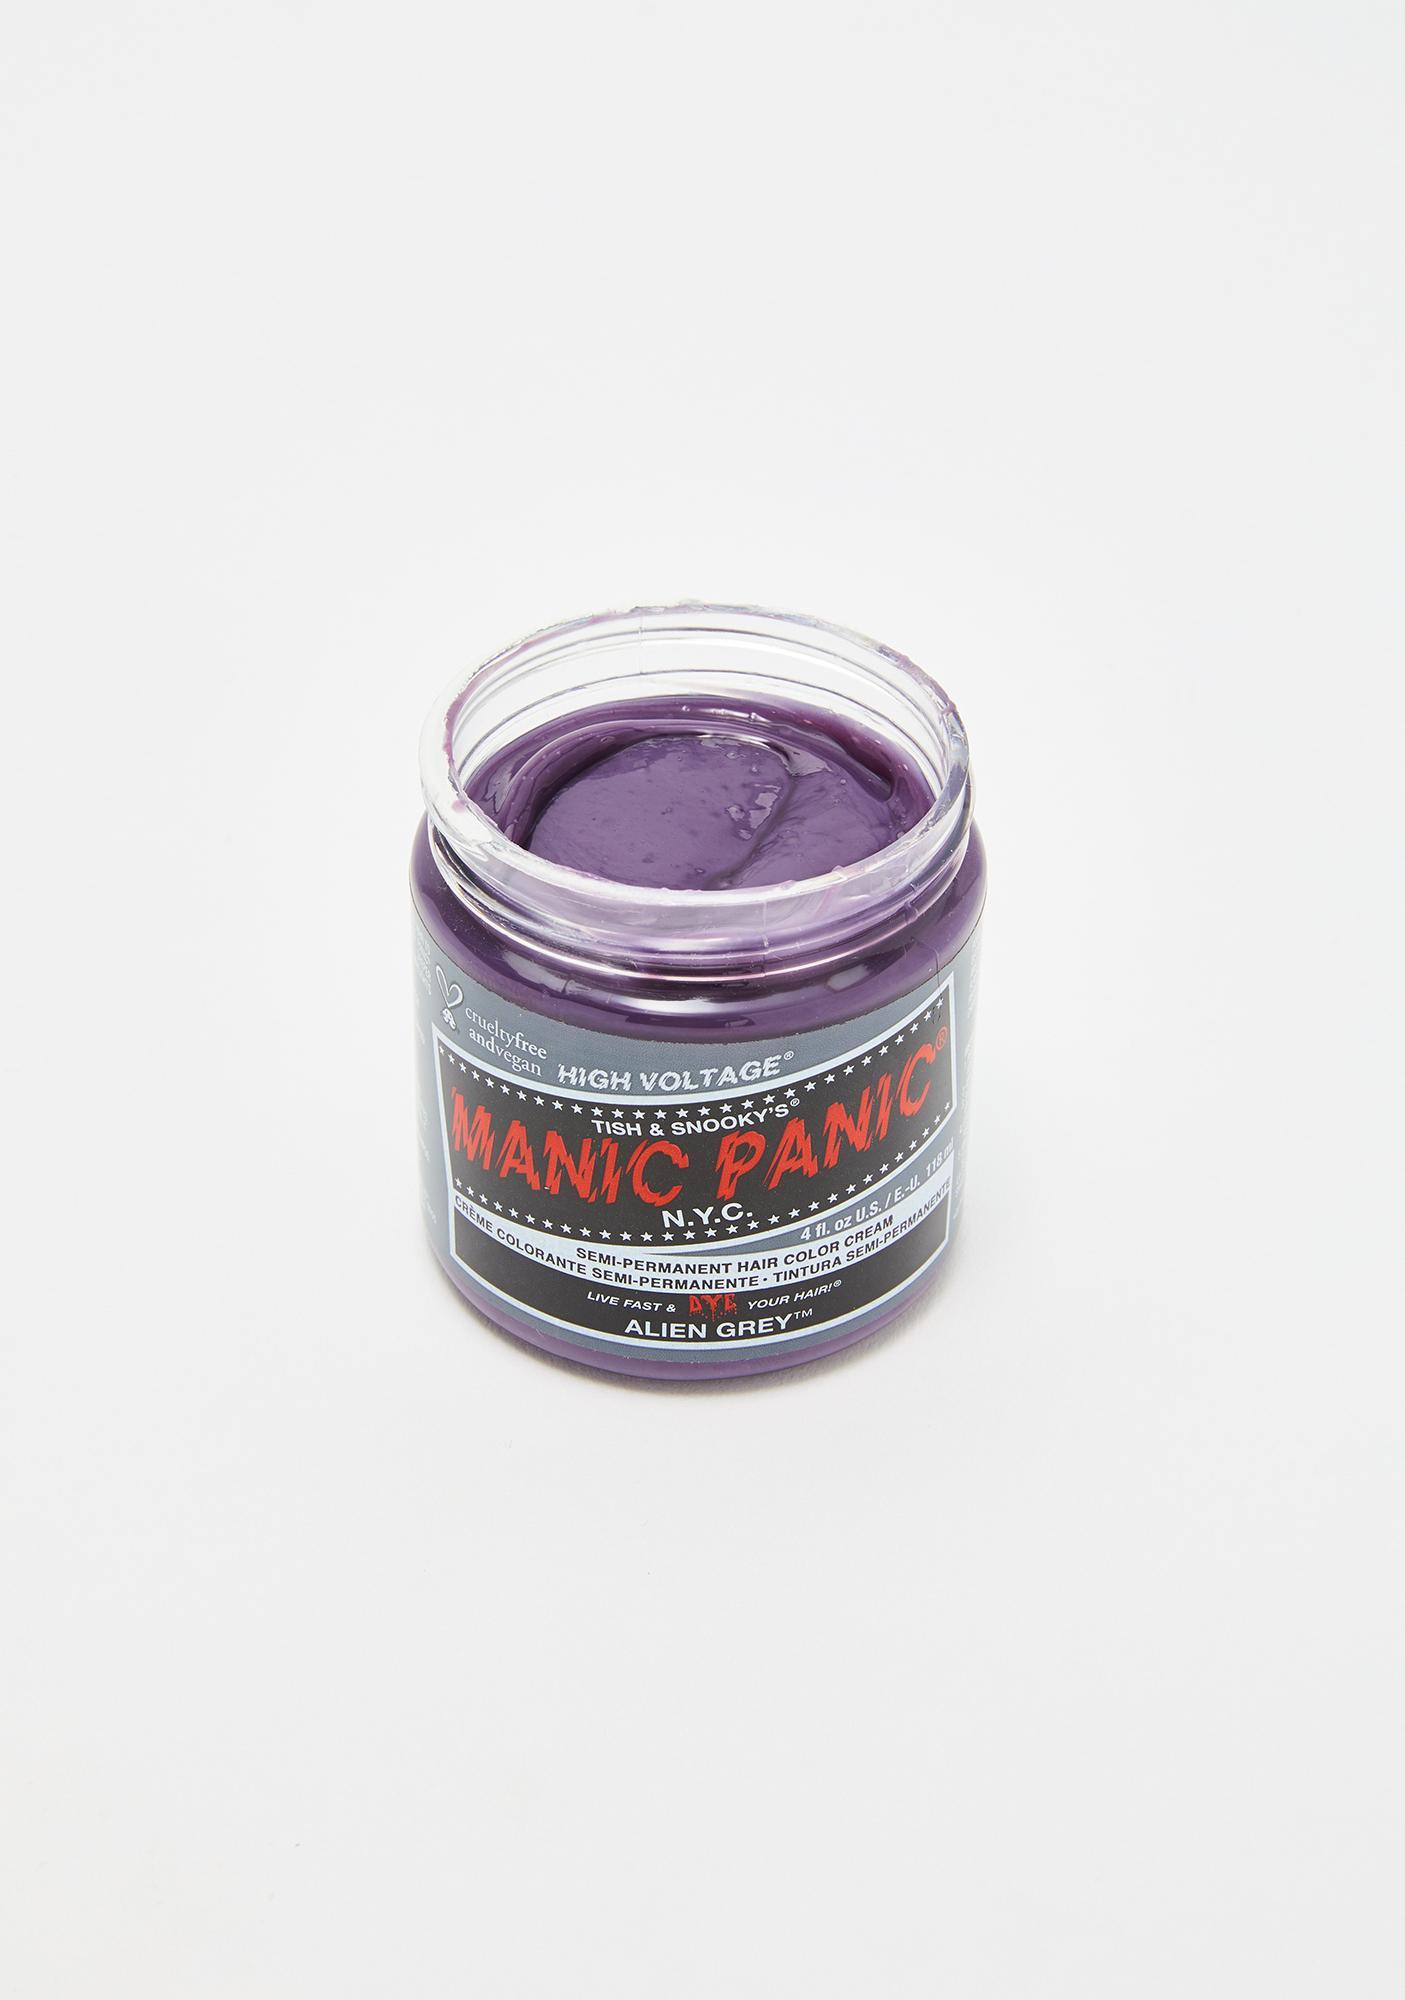 Manic Panic Alien Grey Classic High Voltage Hair Dye